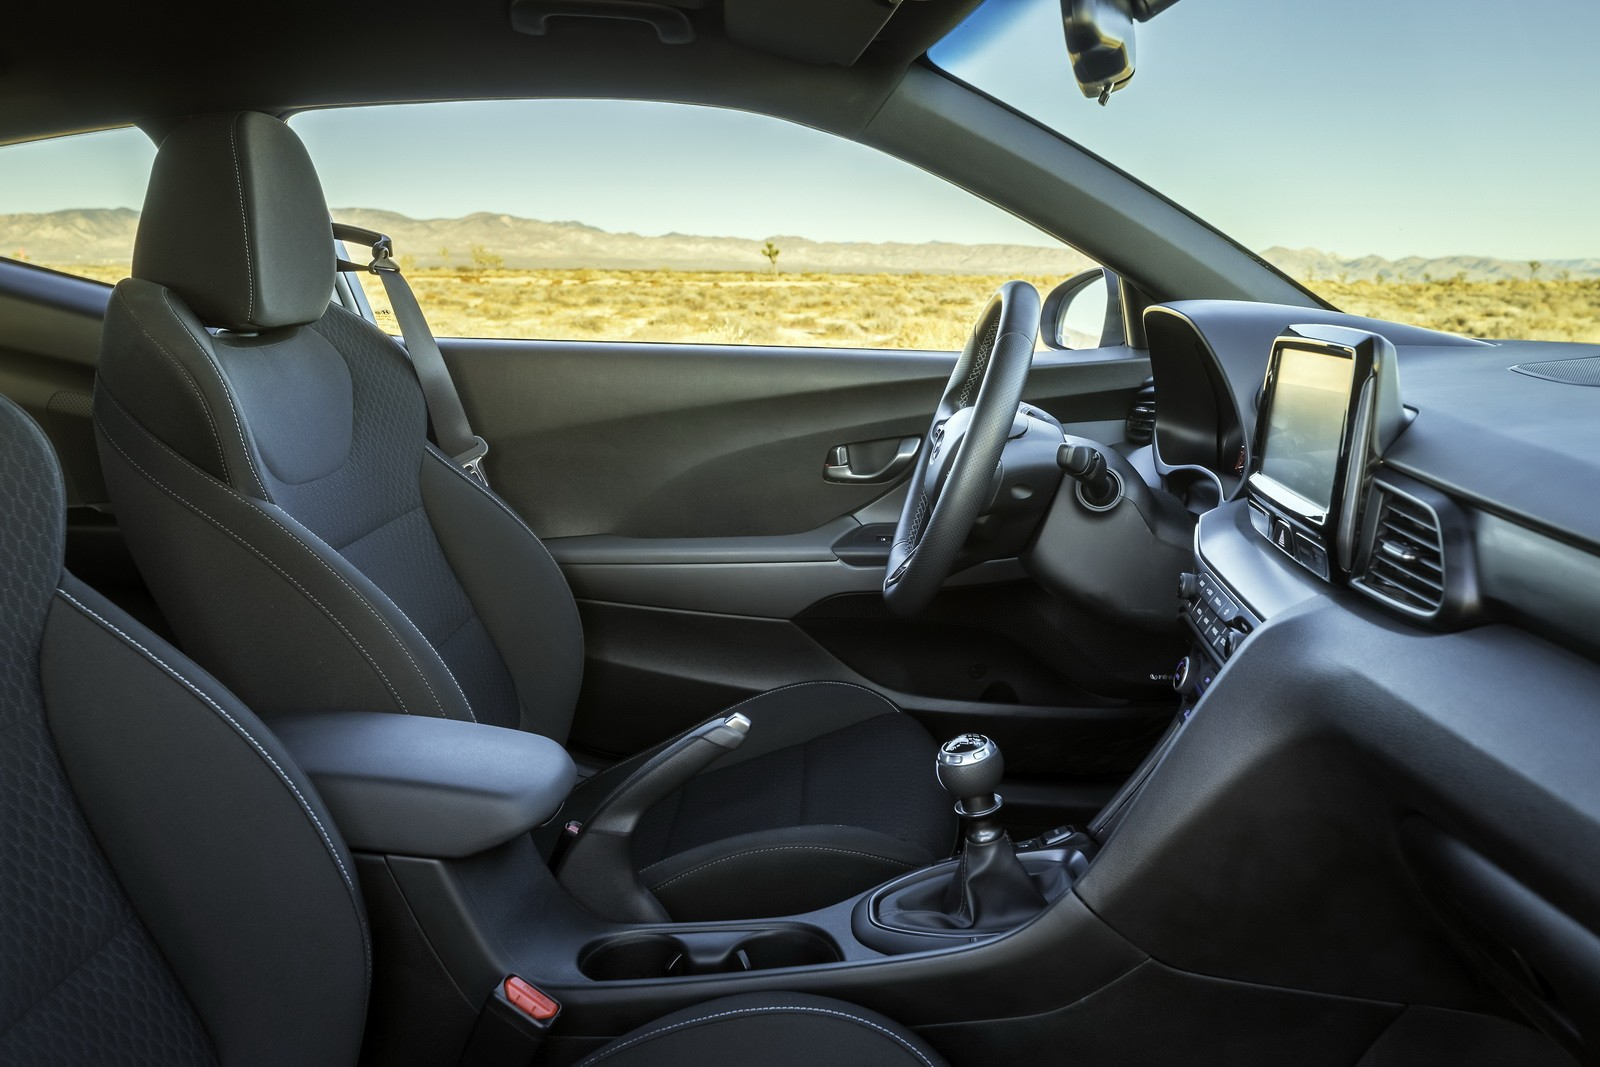 Hyundai Theta III Engine In Development For FWD, RWD, Mid-Engine